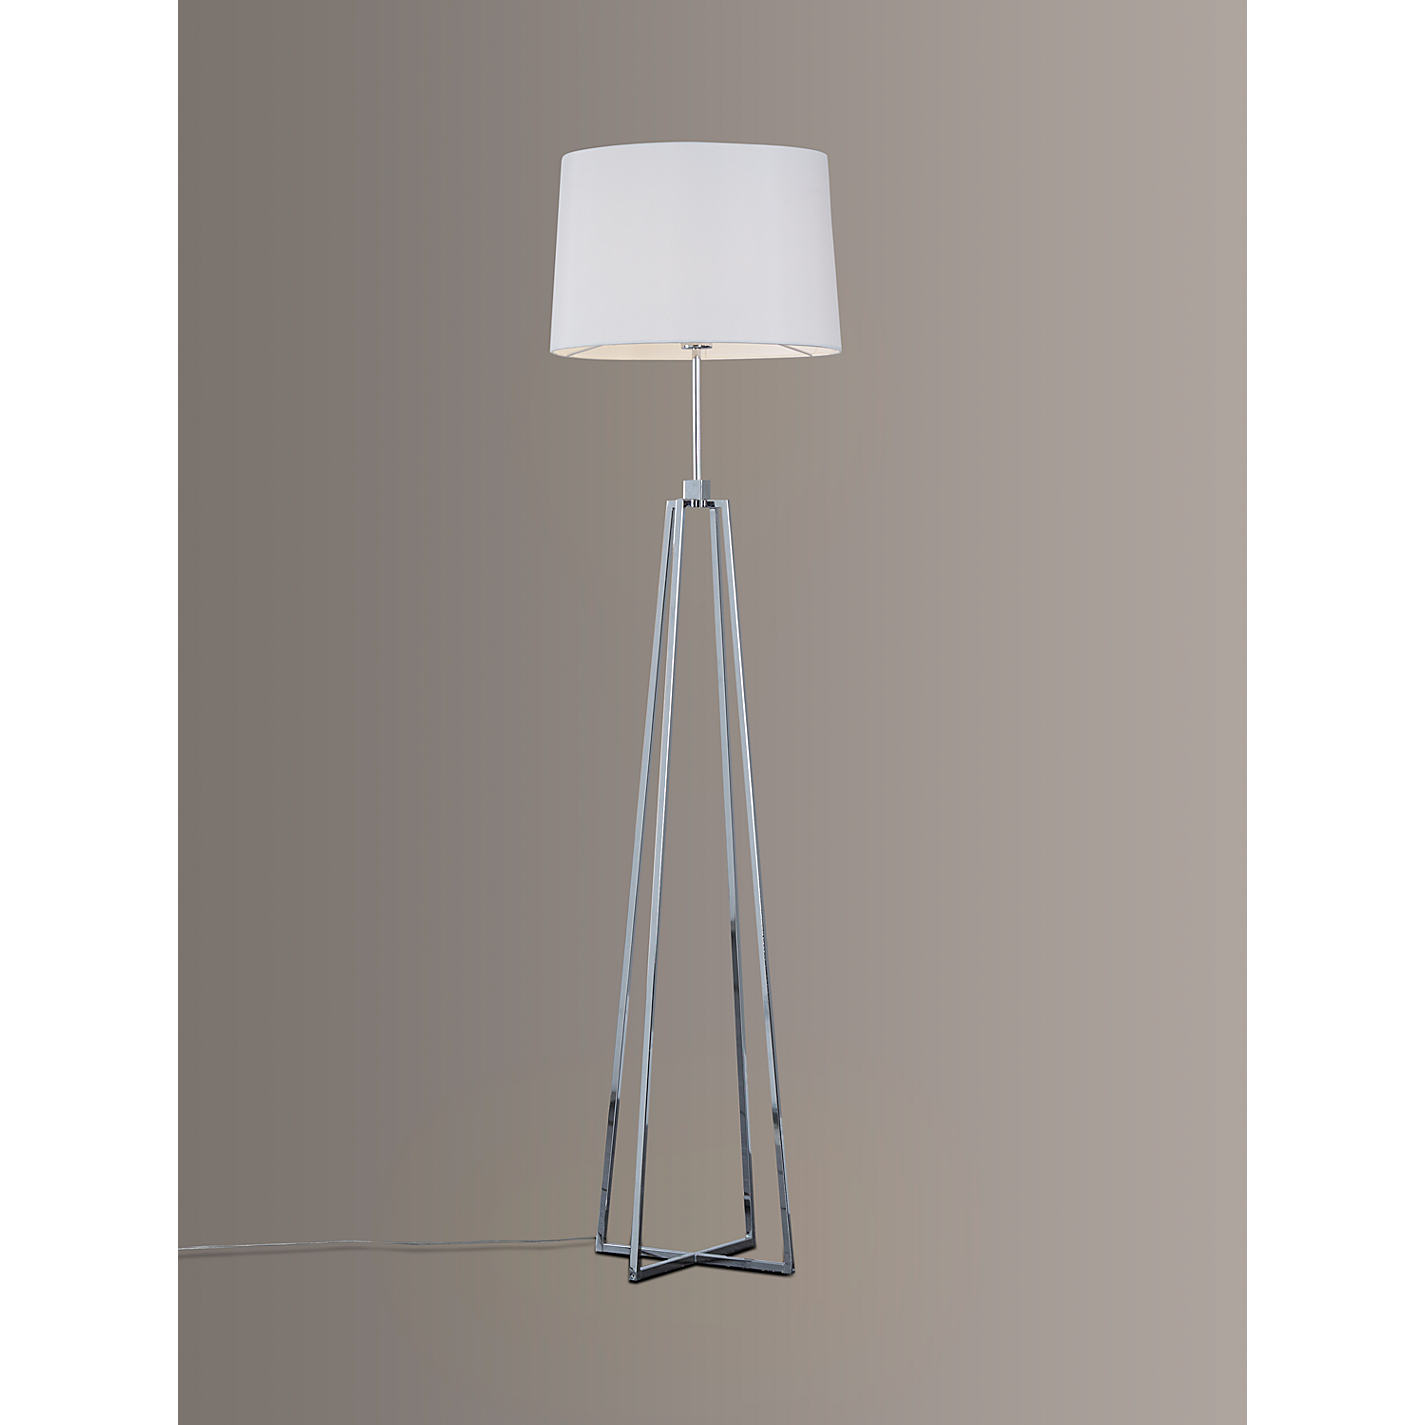 Buy john lewis lockhart floor lamp john lewis buy john lewis lockhart floor lamp online at johnlewis mozeypictures Choice Image